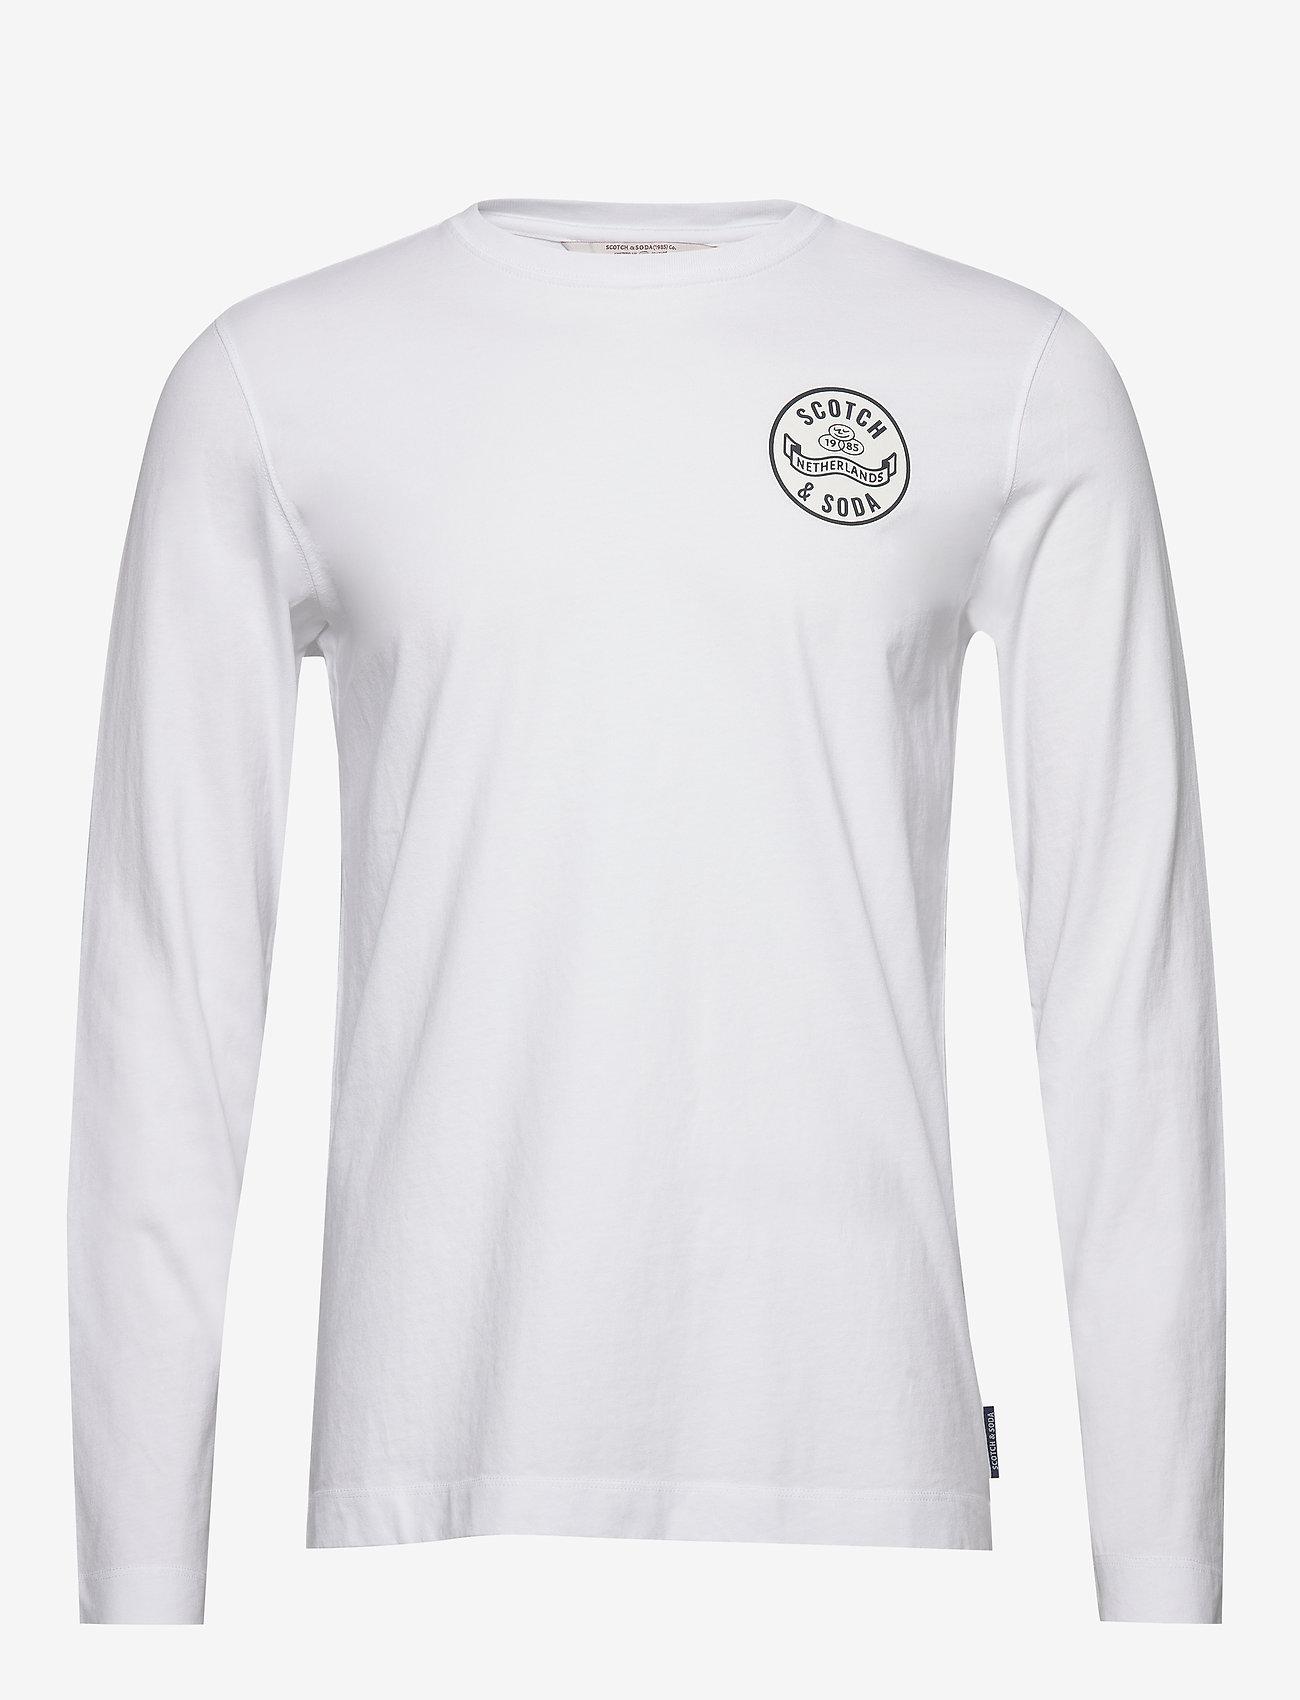 Scotch & Soda - Organic cotton longsleeve tee with chest artwork - basic t-shirts - white - 0